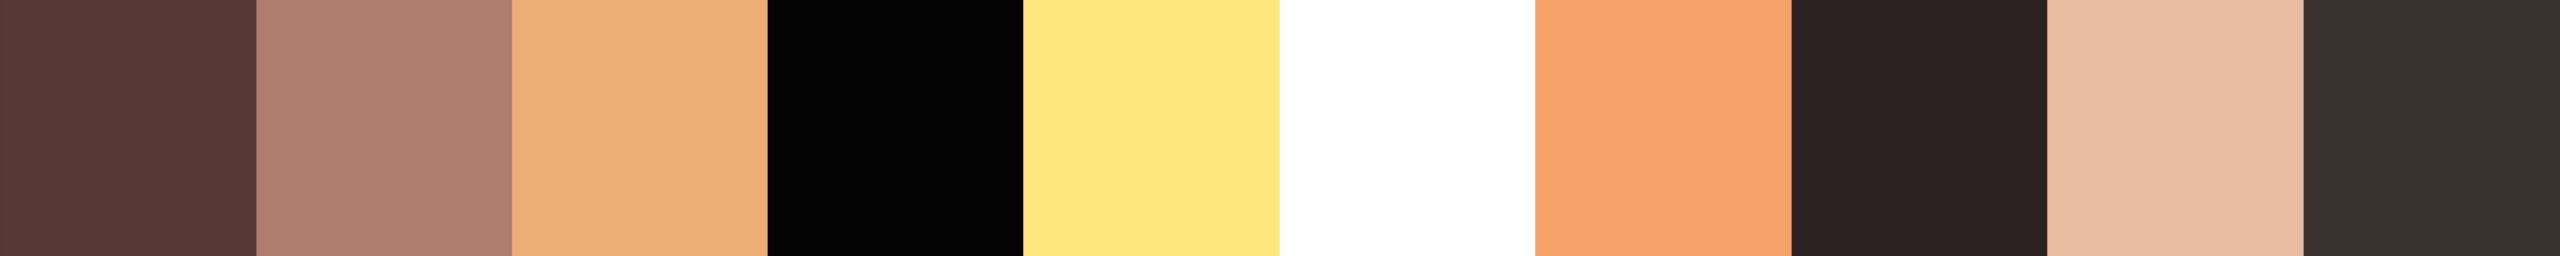 168 Gradavita Color Palette